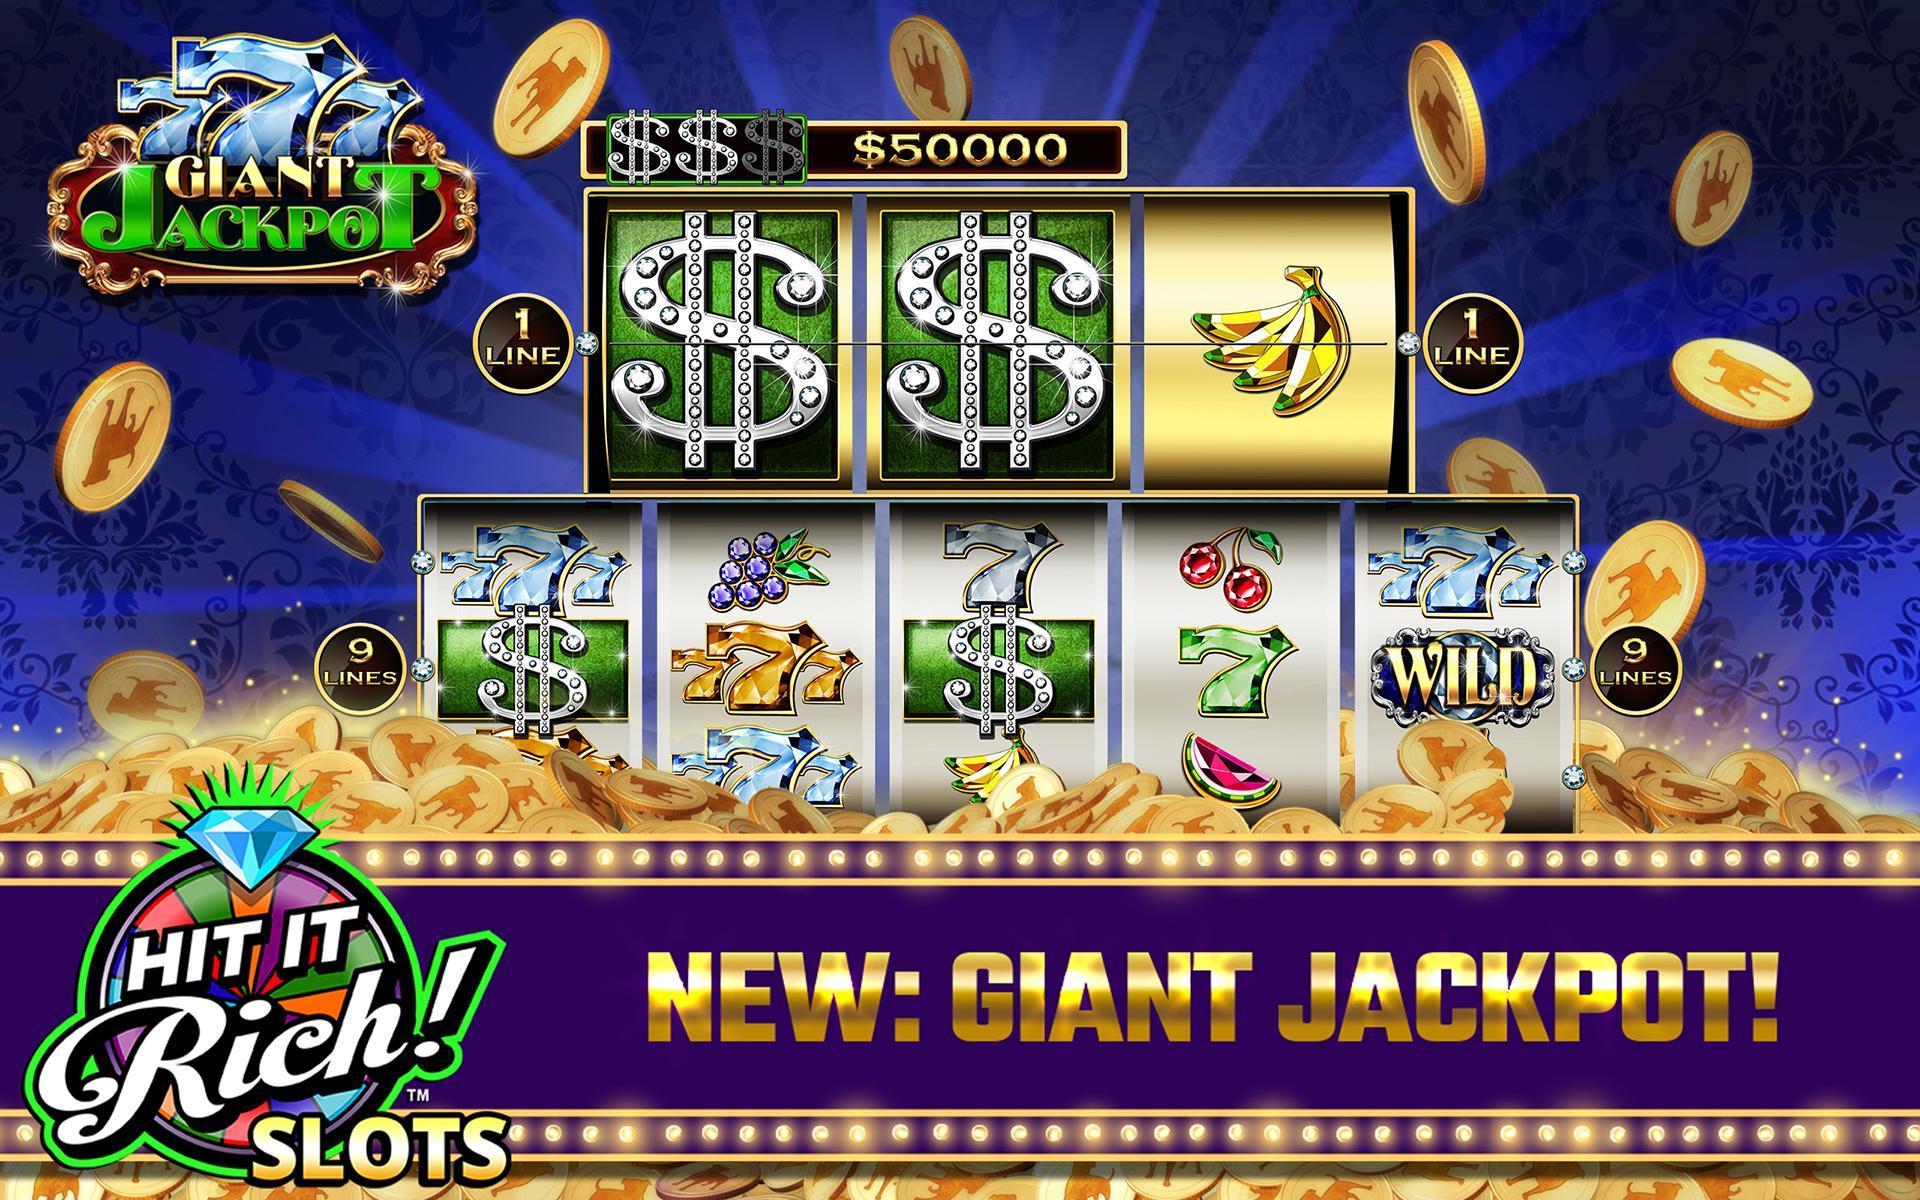 Hit it Rich! Free Casino Slots screenshot #14